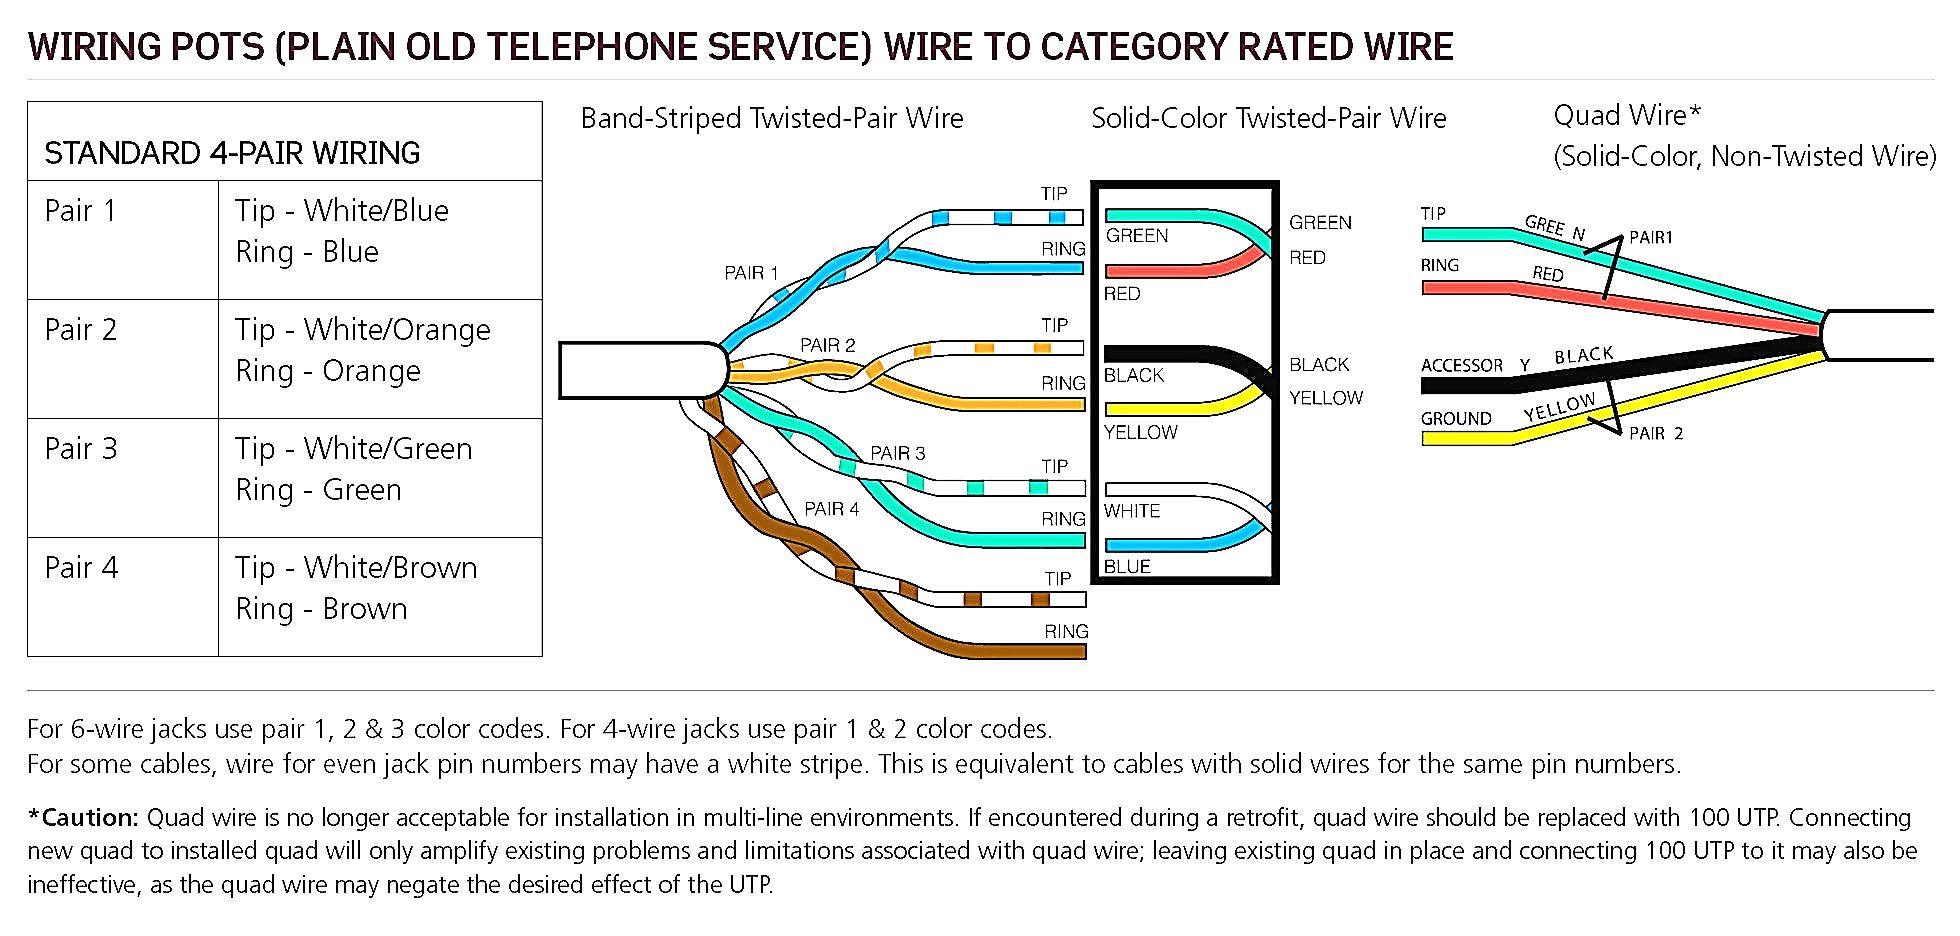 telephone line wiring cat 5e wiring diagram name telephone line wiring diagram uk telephone line wire diagram